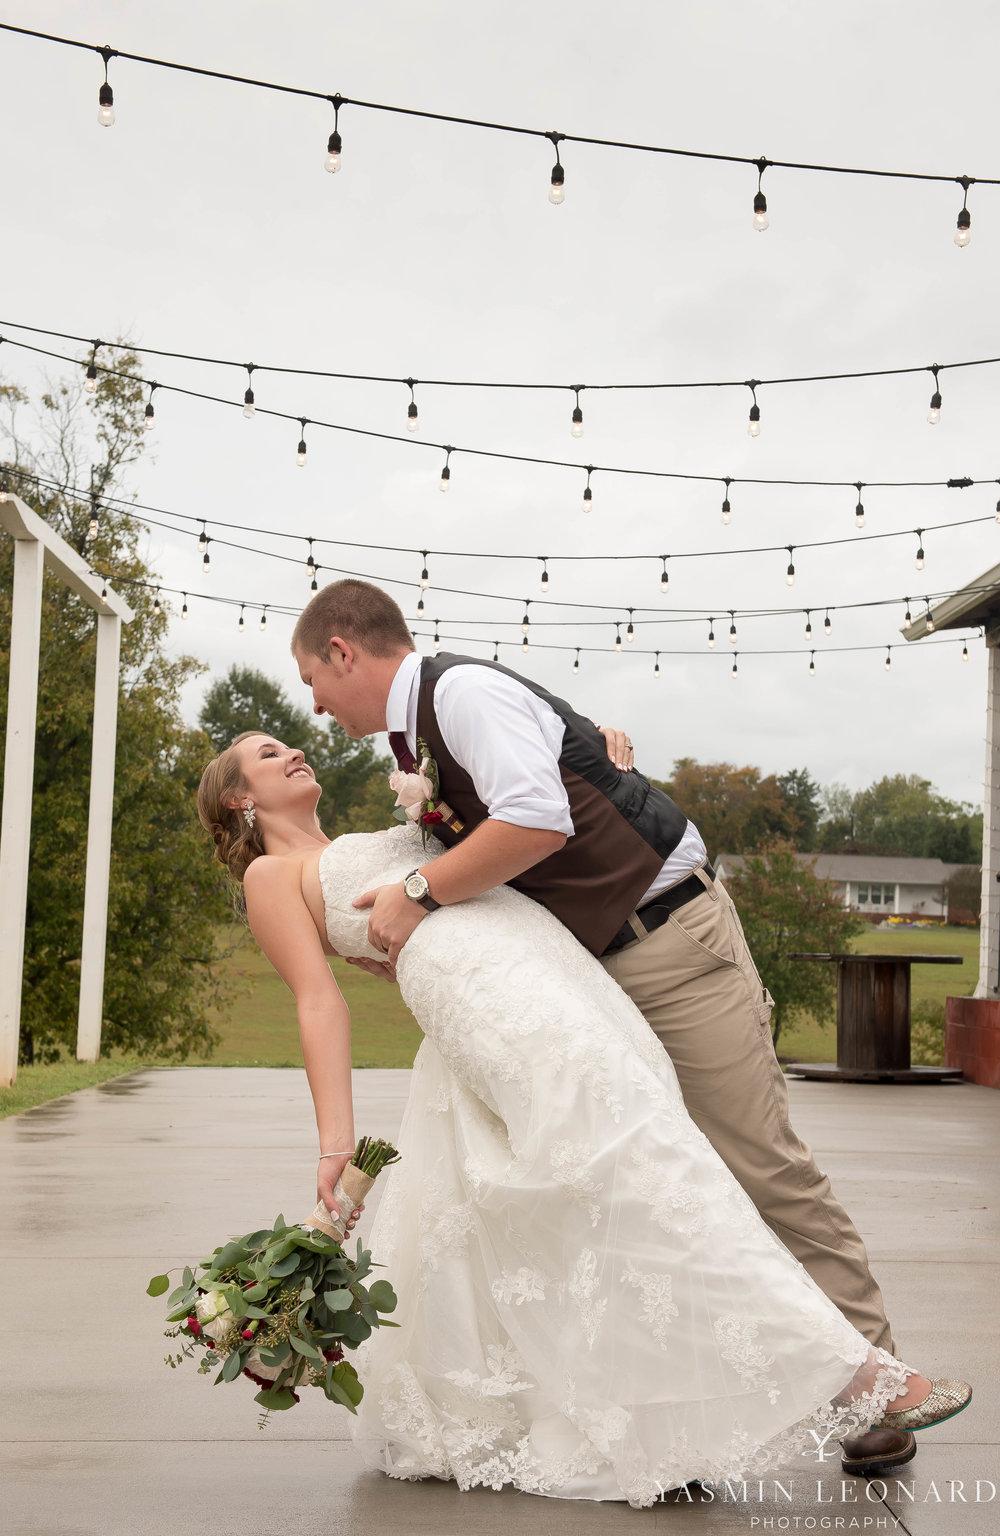 Millikan Farms - NC Wedding Venue - NC Wedding Photographer - Yasmin Leonard Photography - Rain on your wedding day-50.jpg